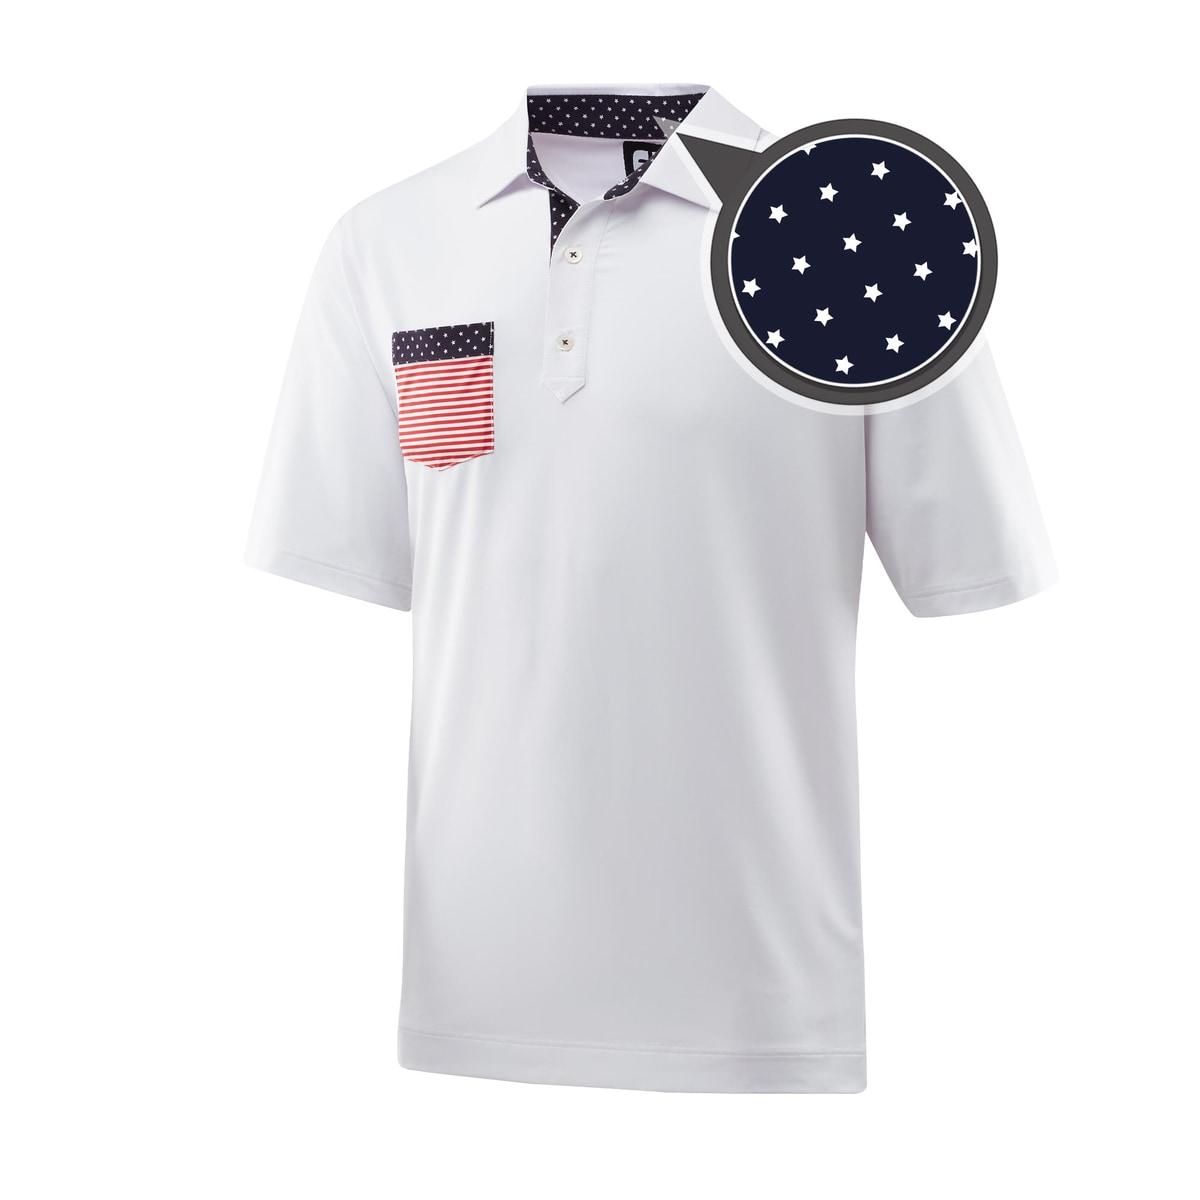 Solid Lisle Flag Chest Pocket Self Collar